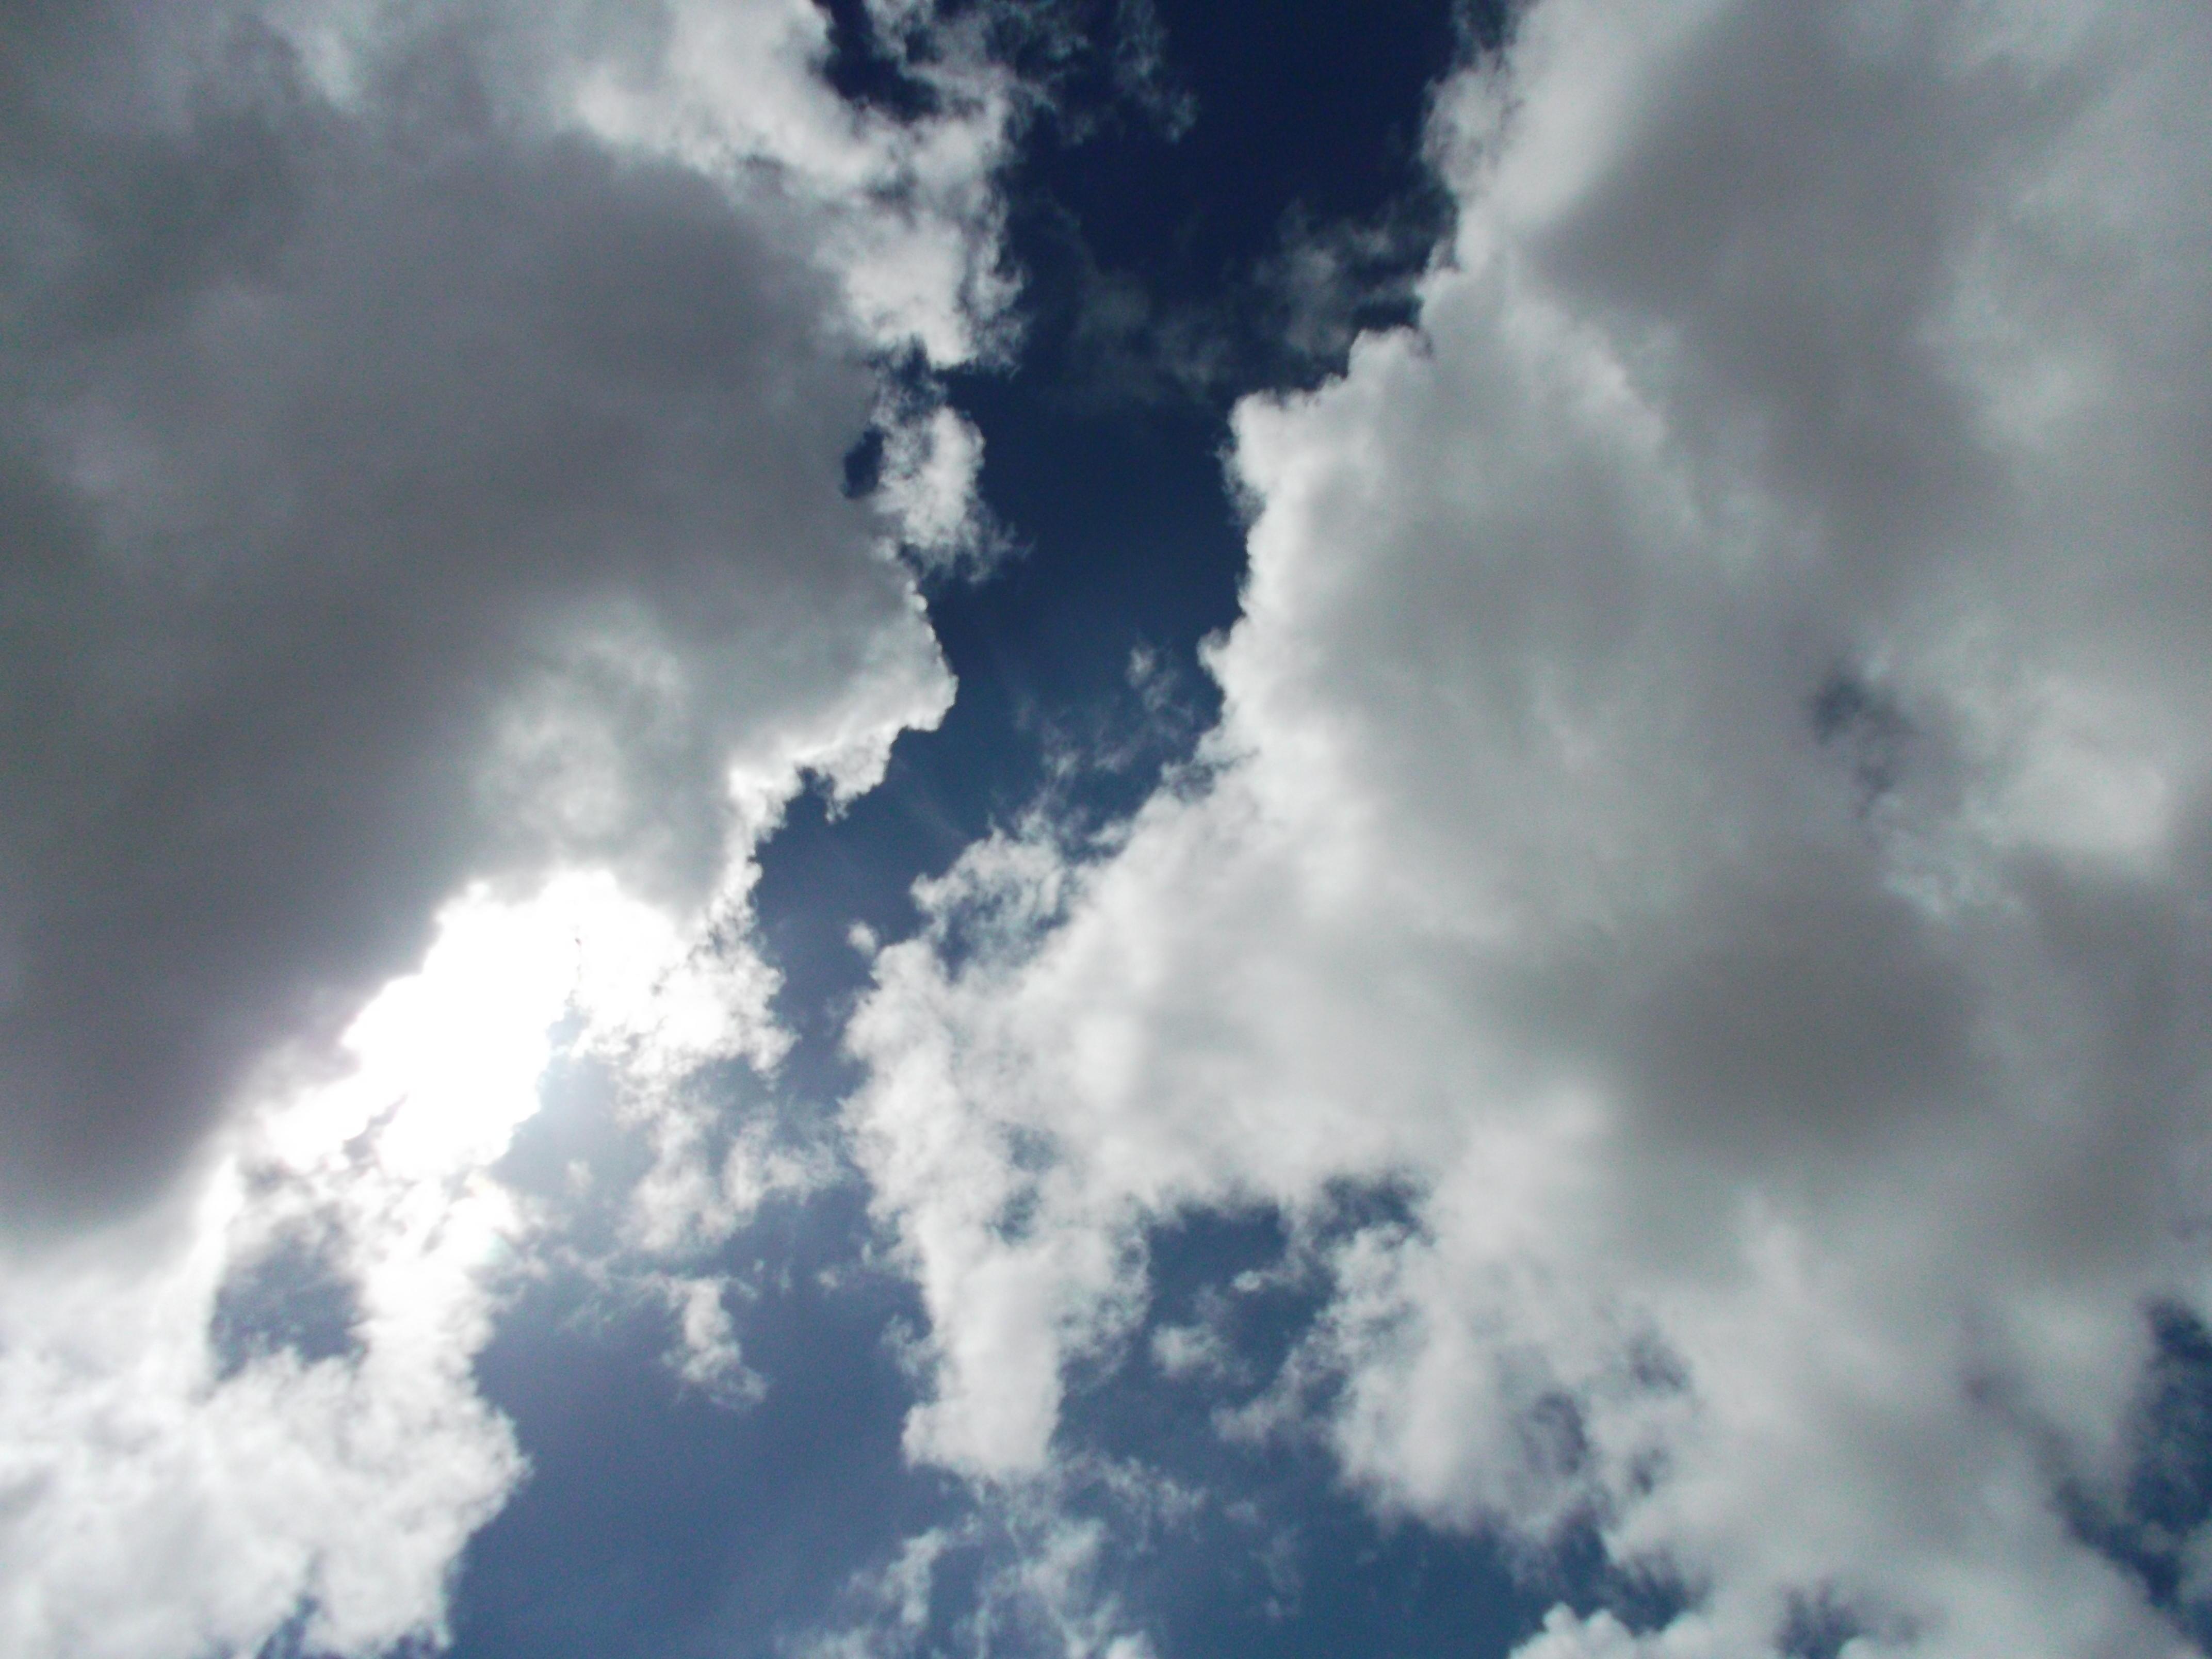 2013-06-13 Longitude -0.371 Latitude 49.182 Altitude 29 Heure 14h55